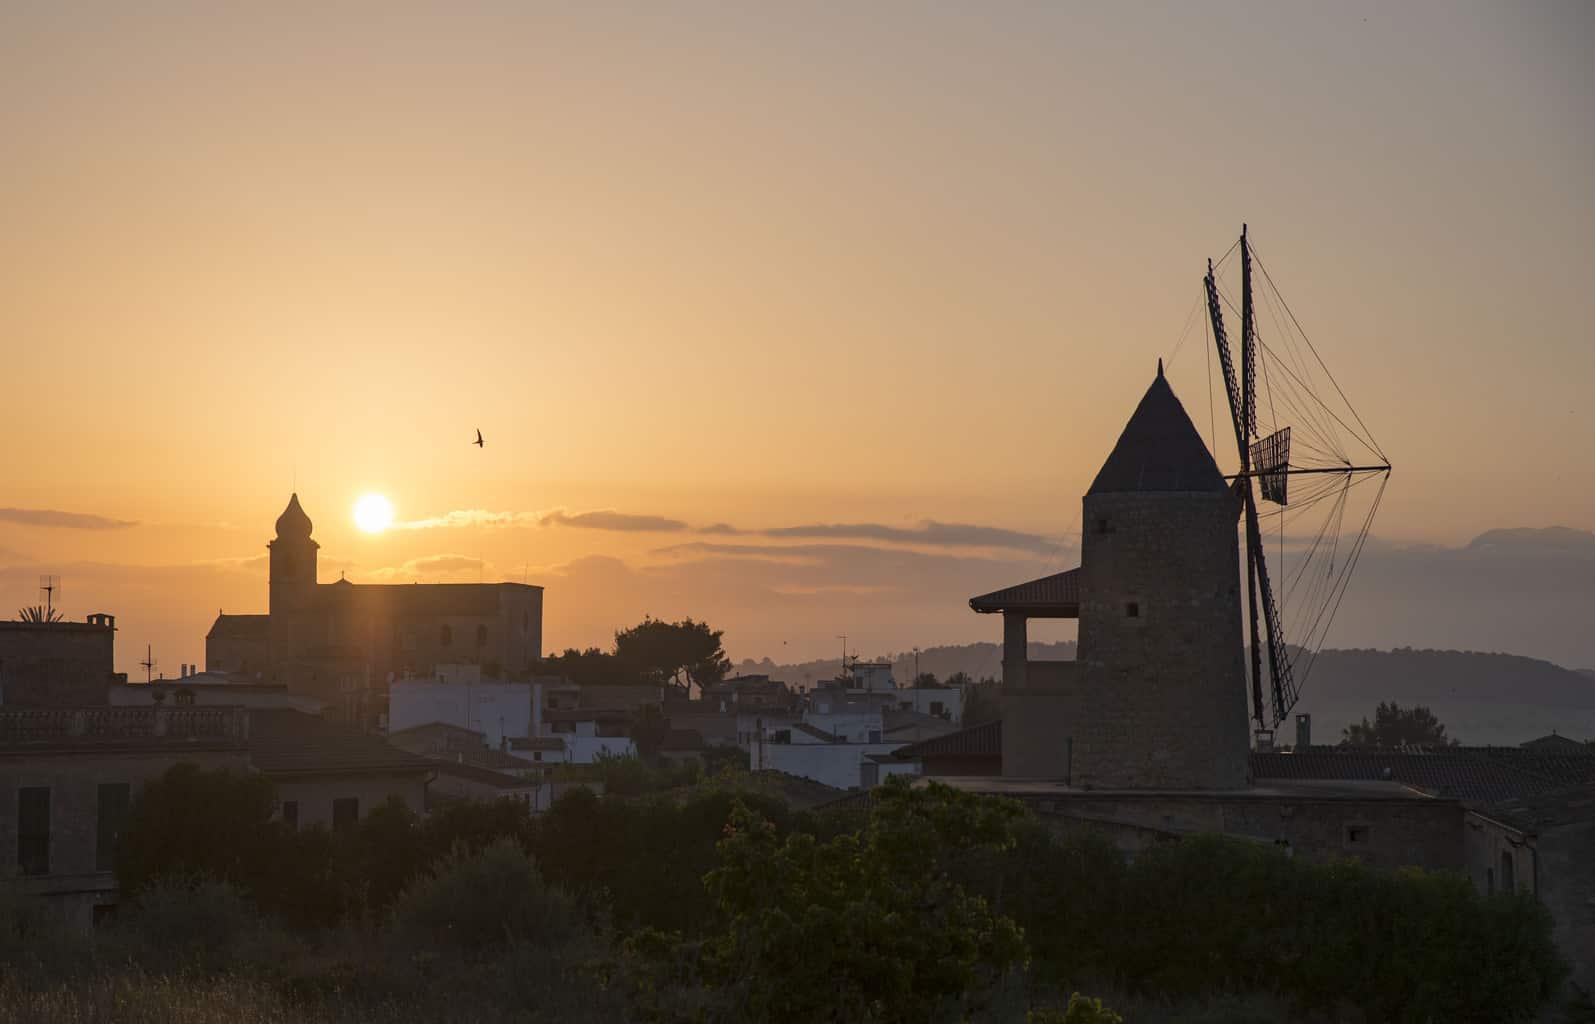 Sunrise in Mallorca, Spain